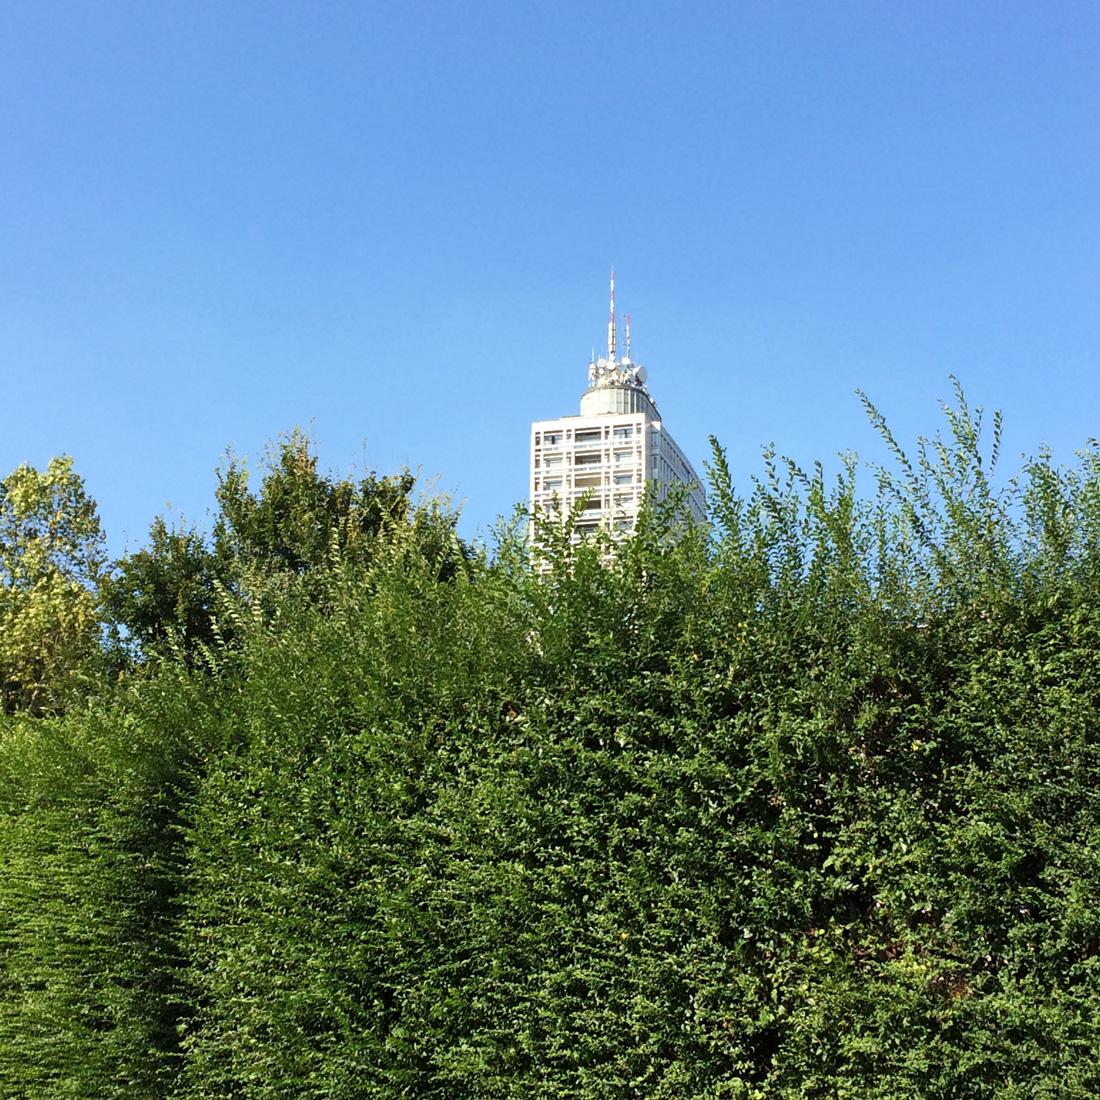 città misteriosa : fotografia urbana di (b)ananartista sbuff